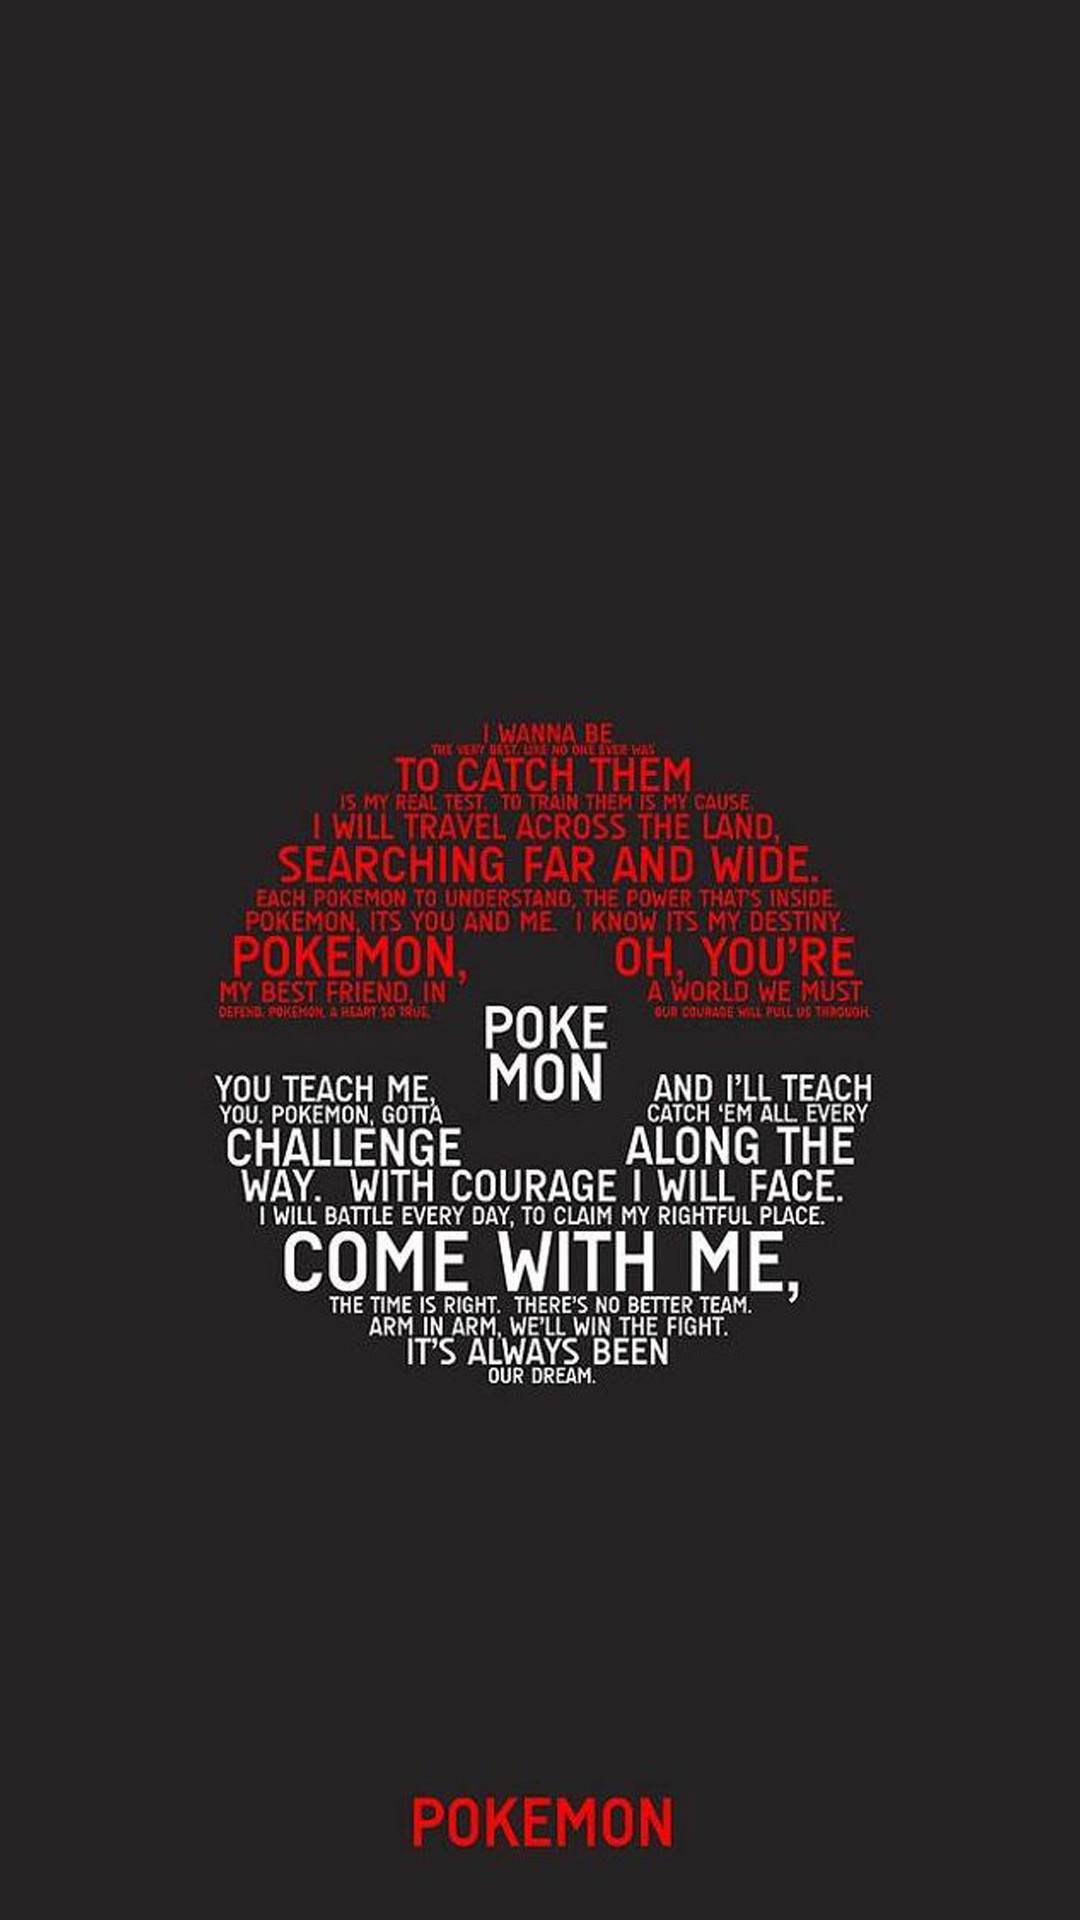 Pokemon Go iPhone 7 wallpaper